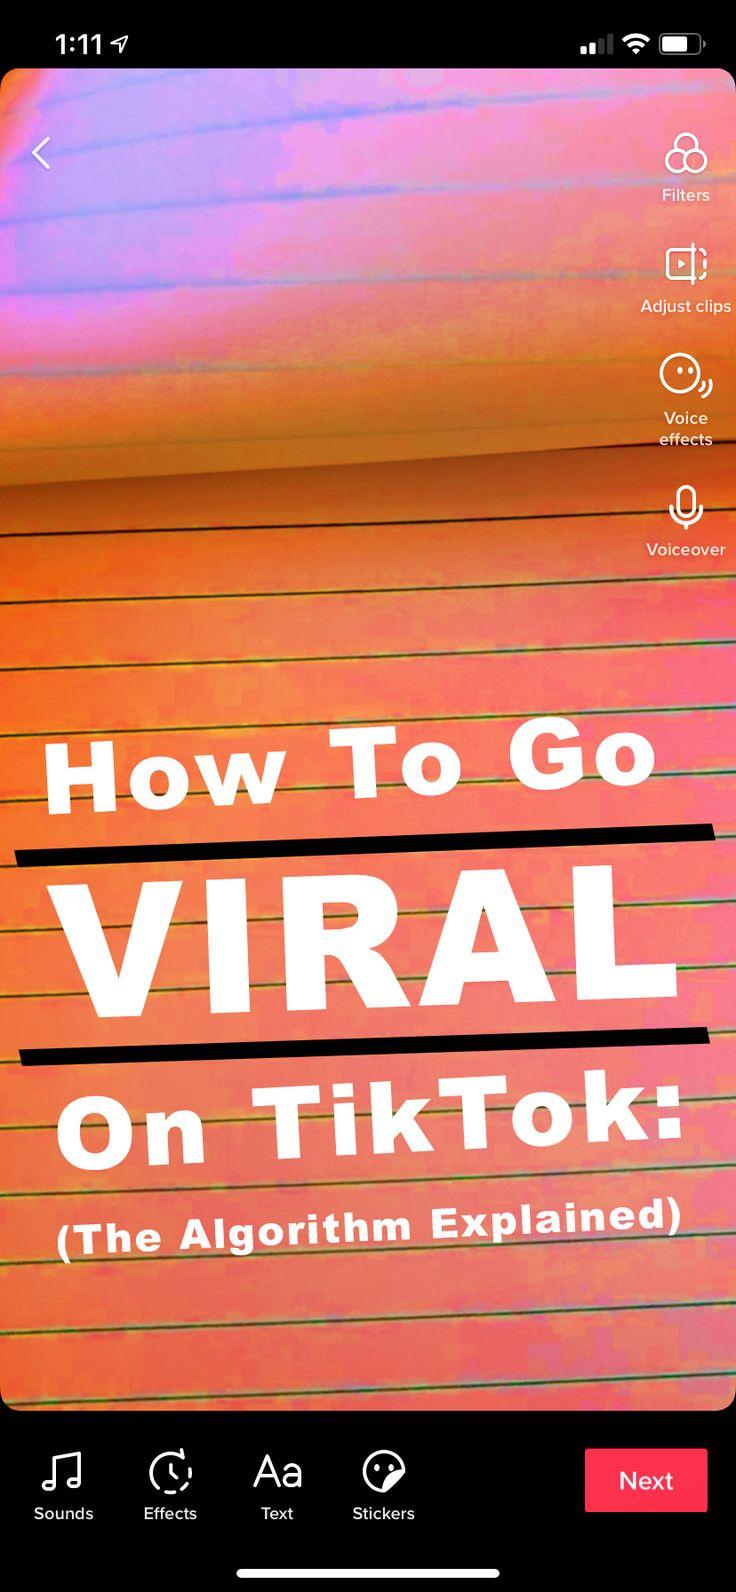 How to go viral on tiktok the algorithm explained